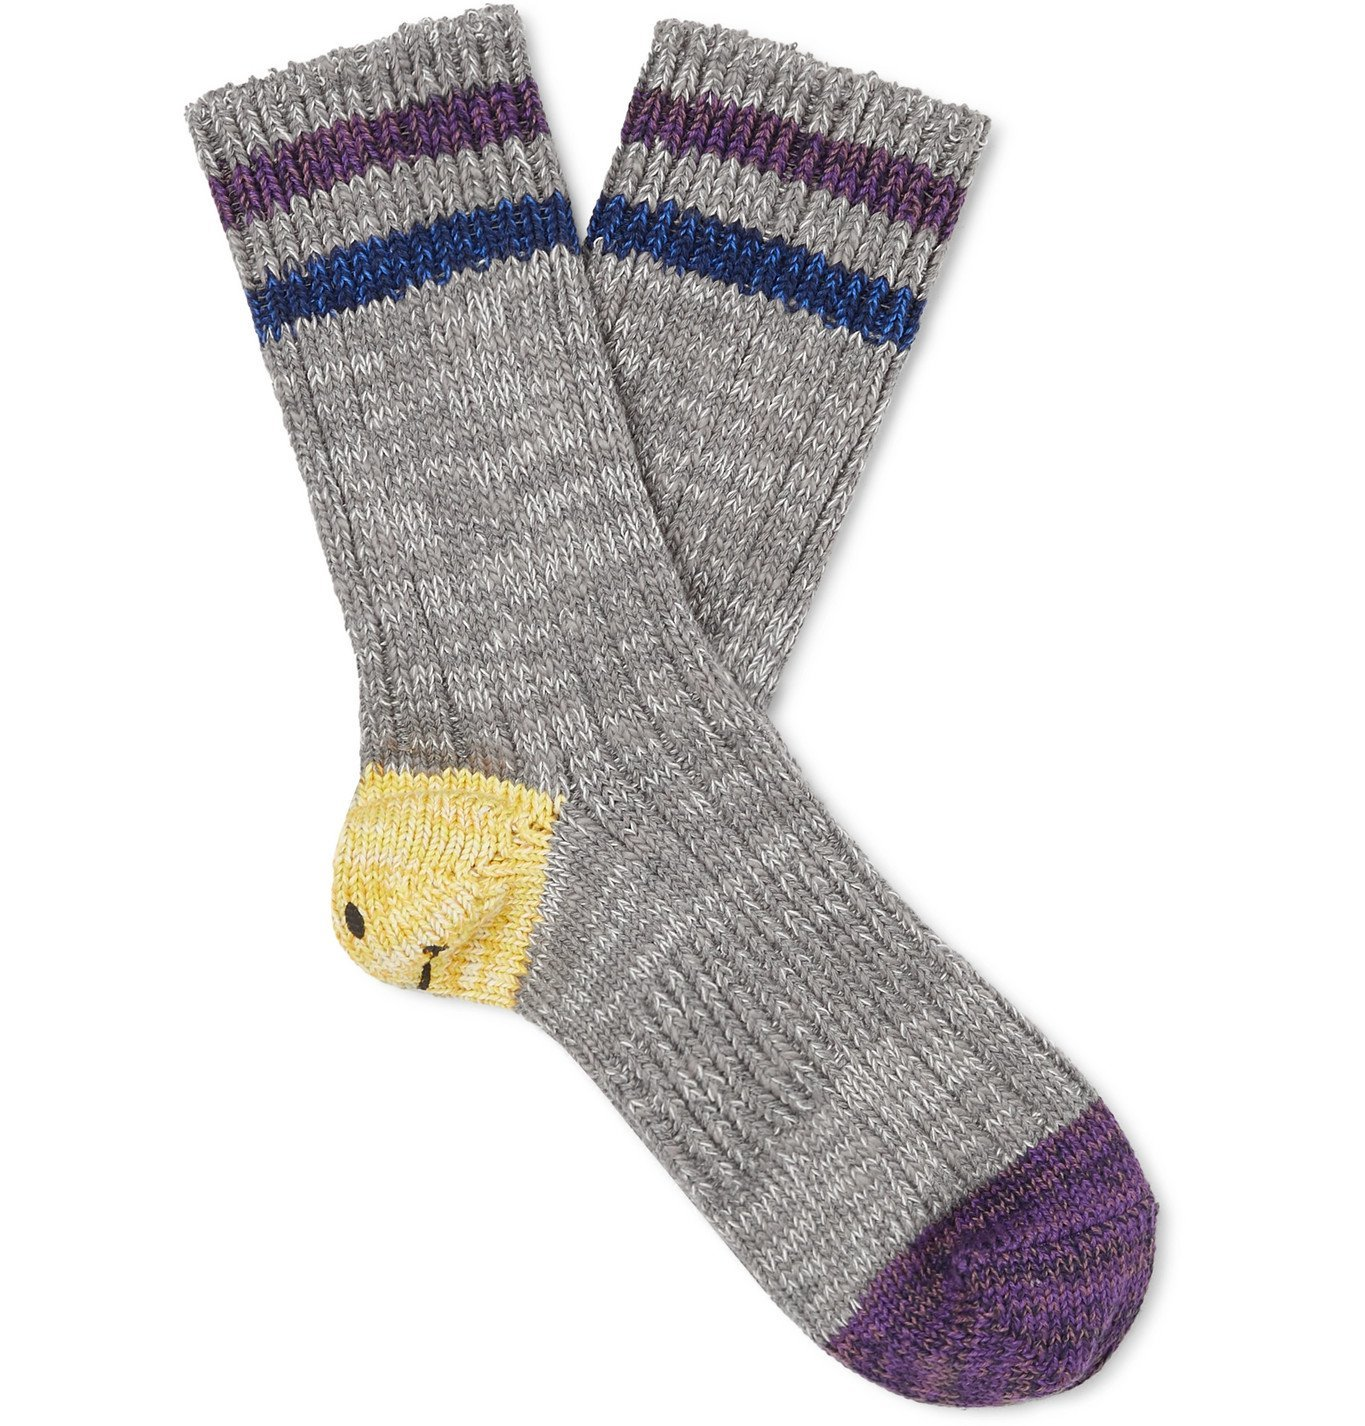 KAPITAL - Ivy Smilie Striped Cotton and Hemp-Blend Socks - Gray